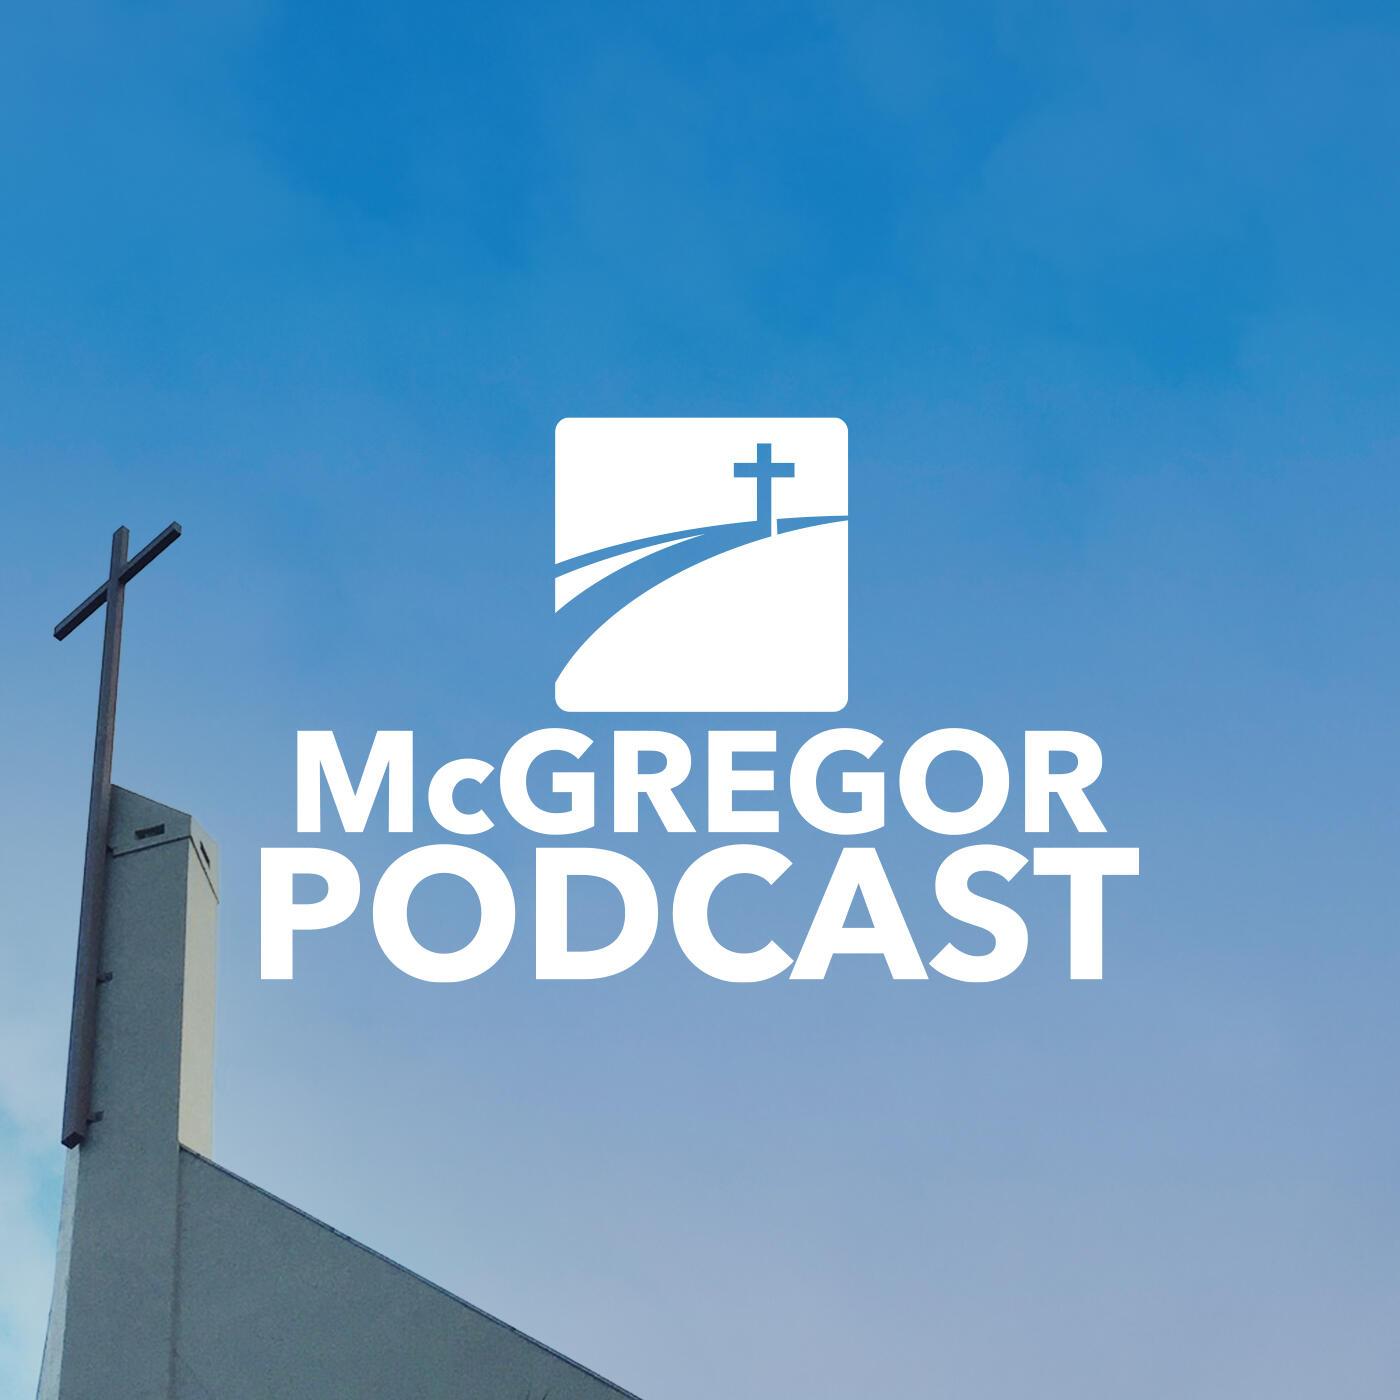 McGregor Podcast